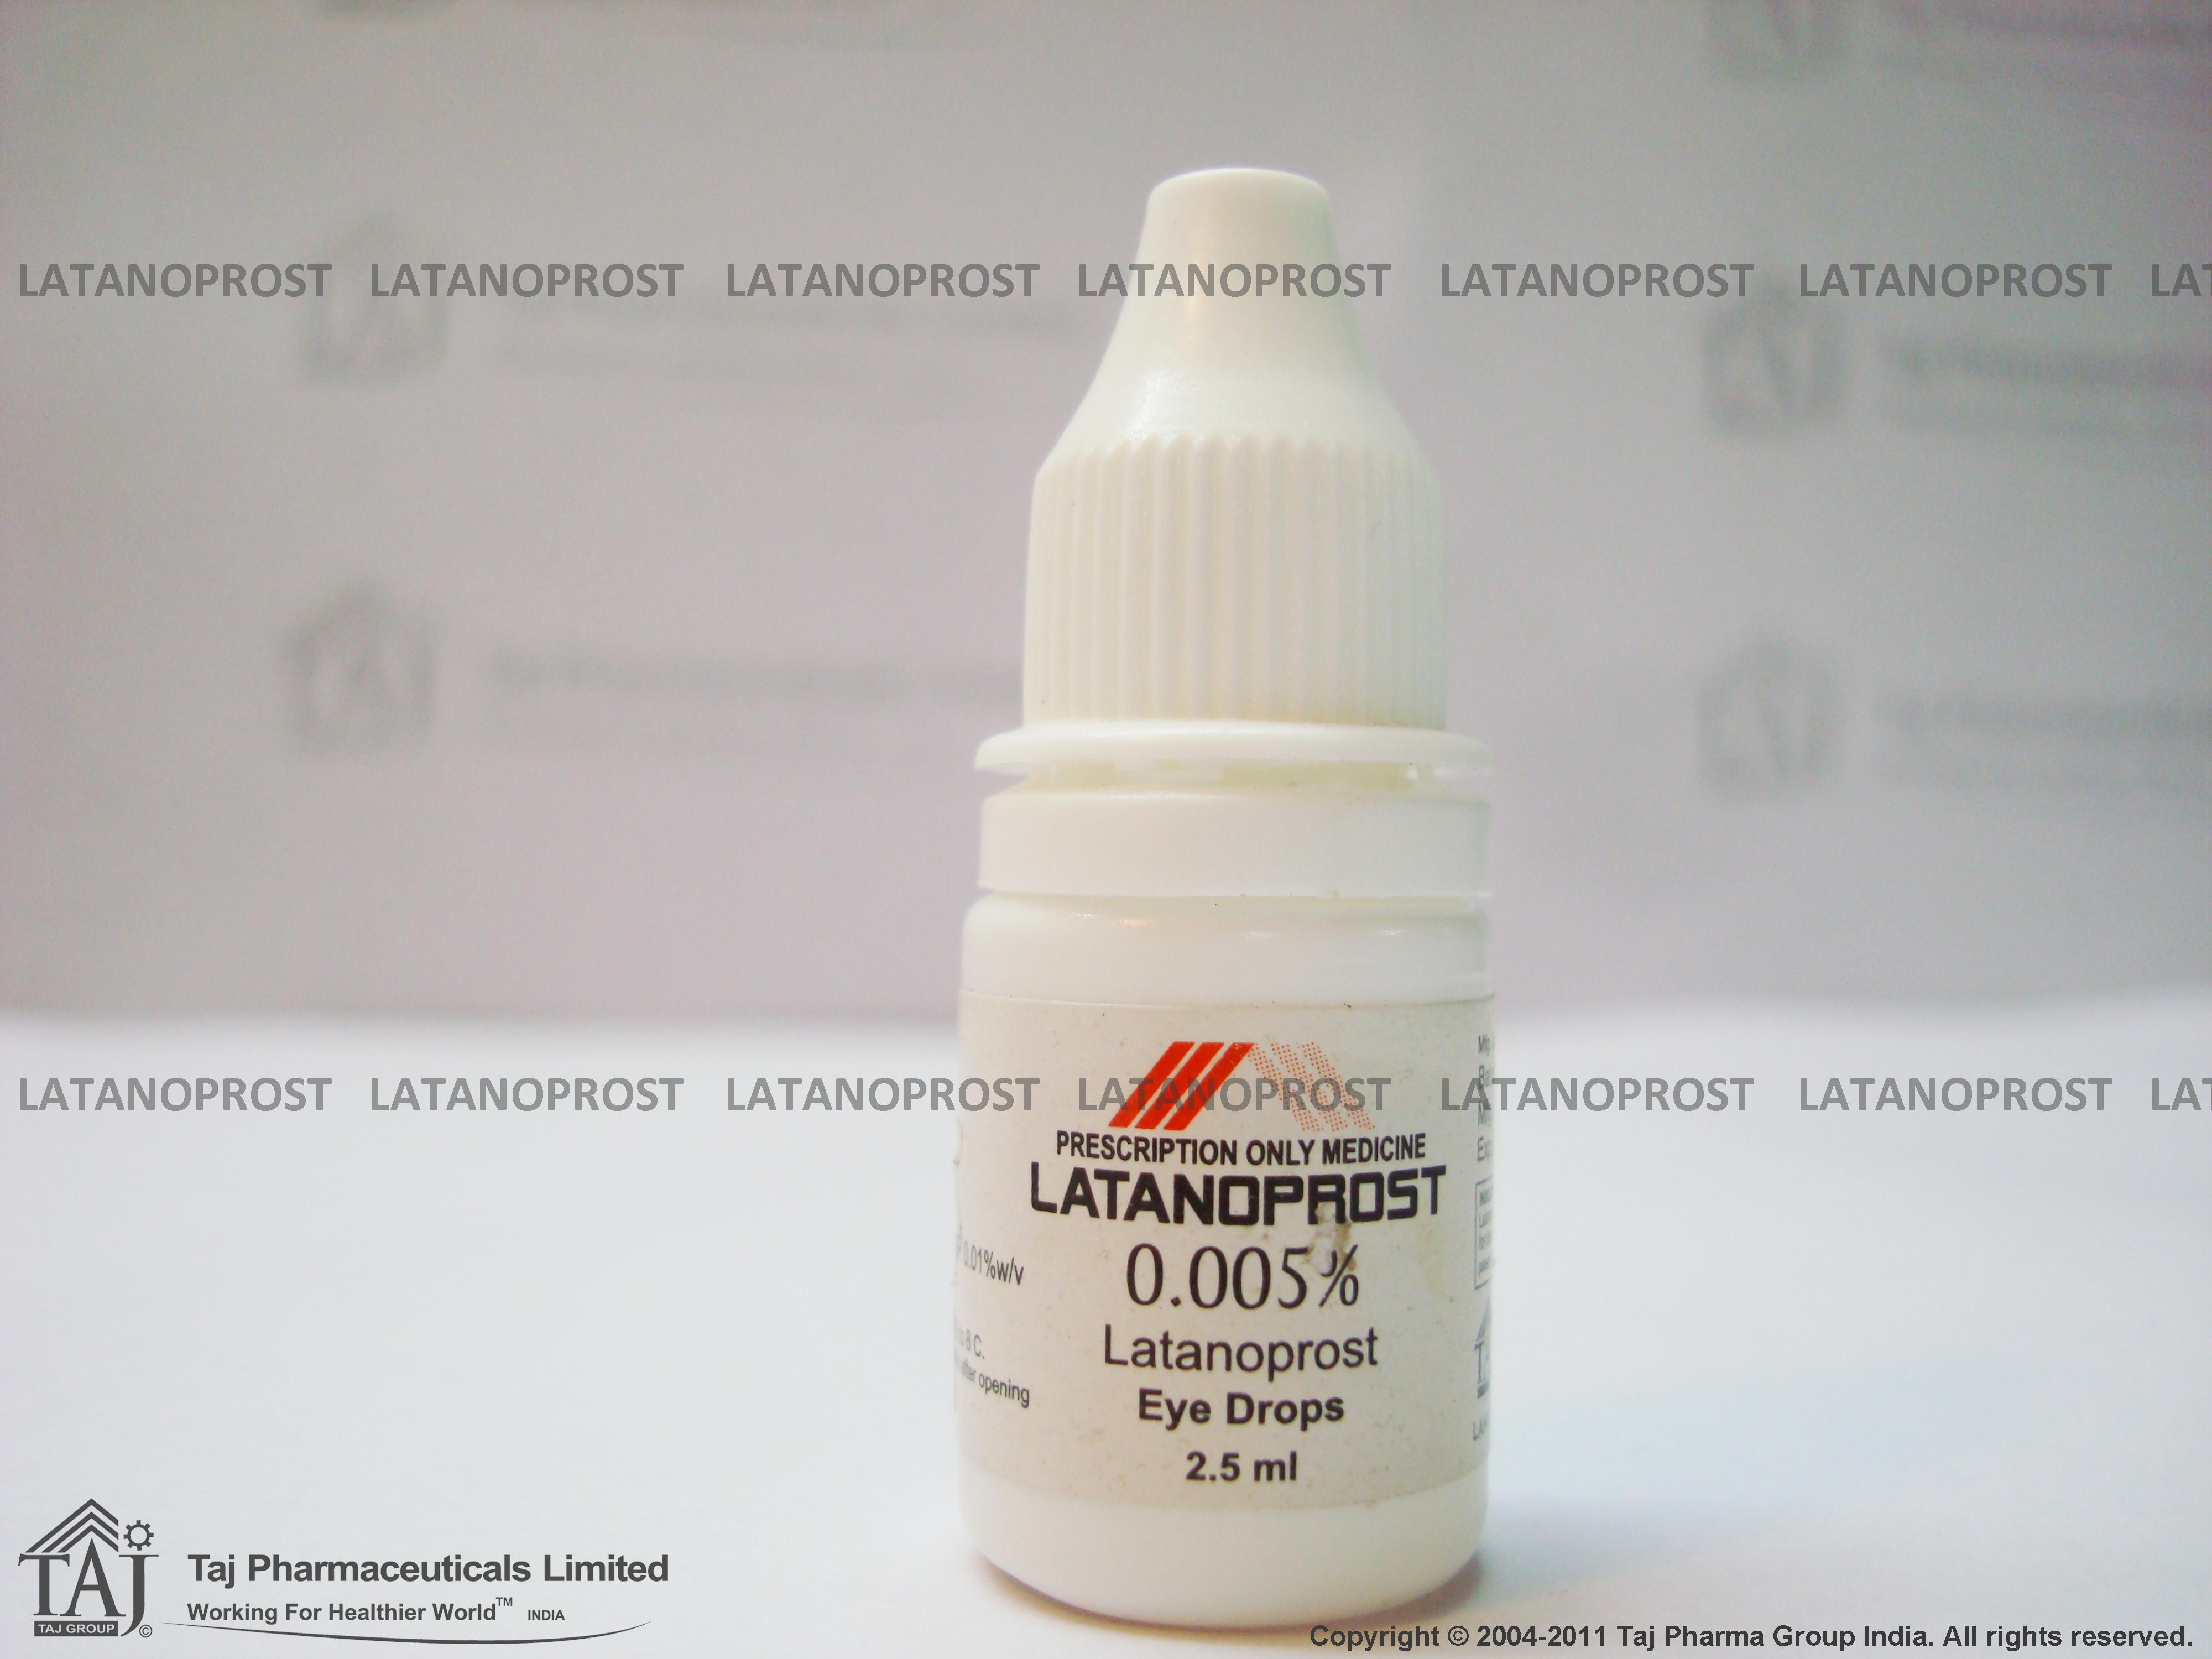 Latanoprost Xalatan Eye Drops